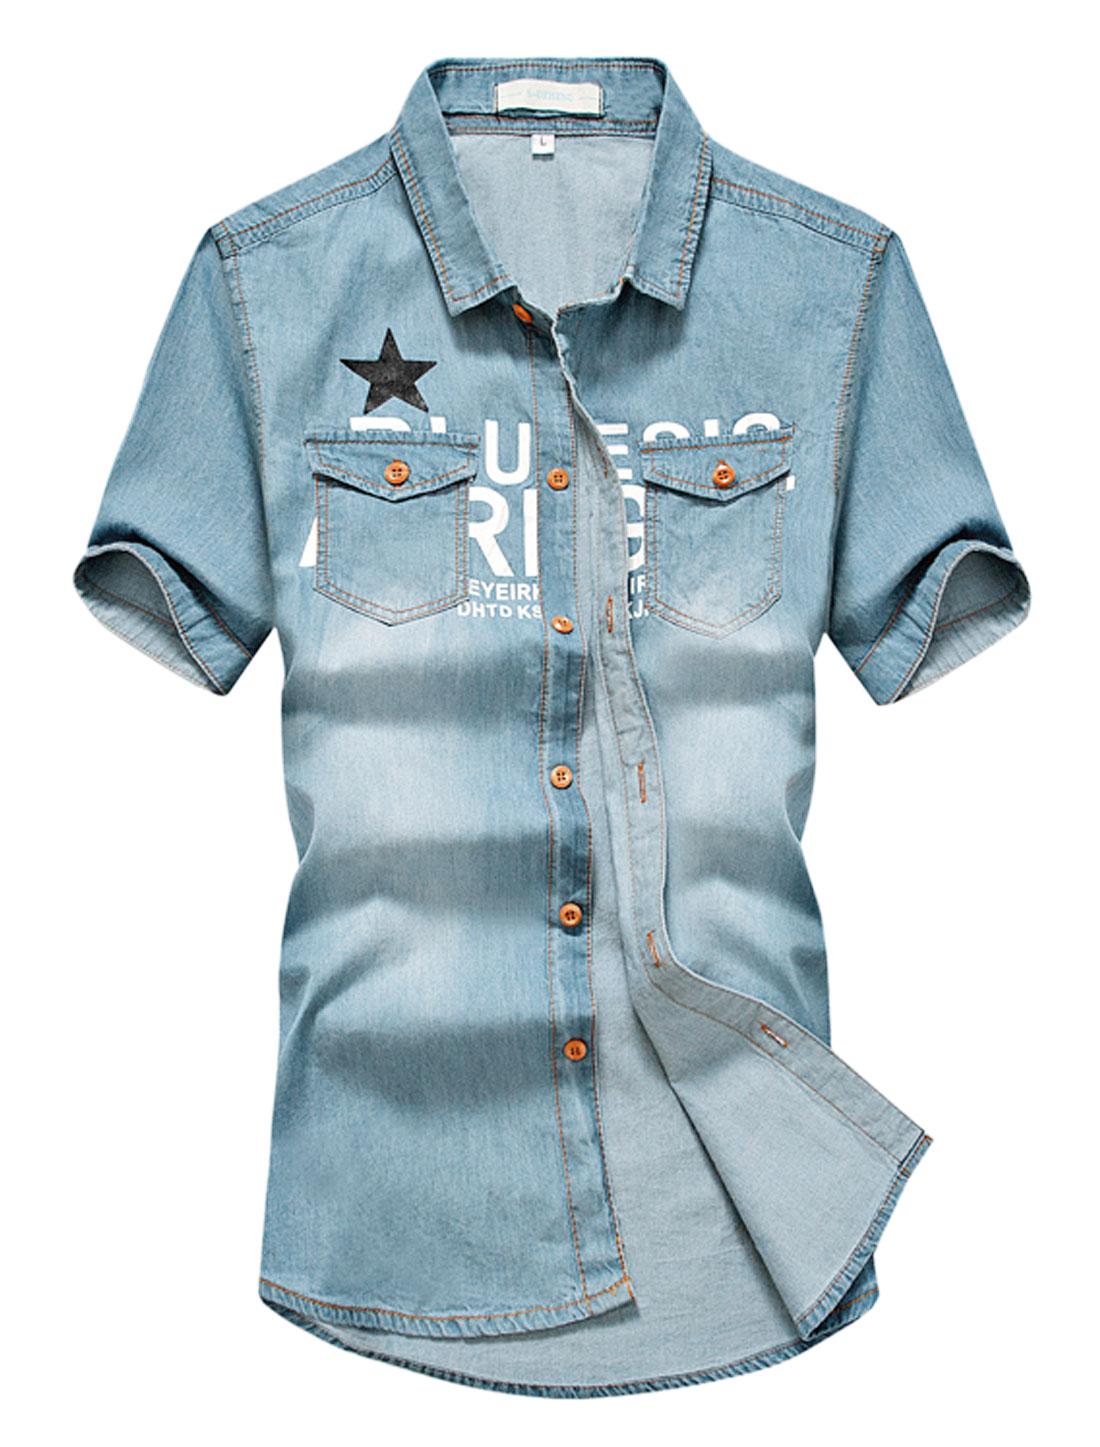 Men Stars Letters Prints Short Sleeves Casual Denim Shirt Sky Blue M